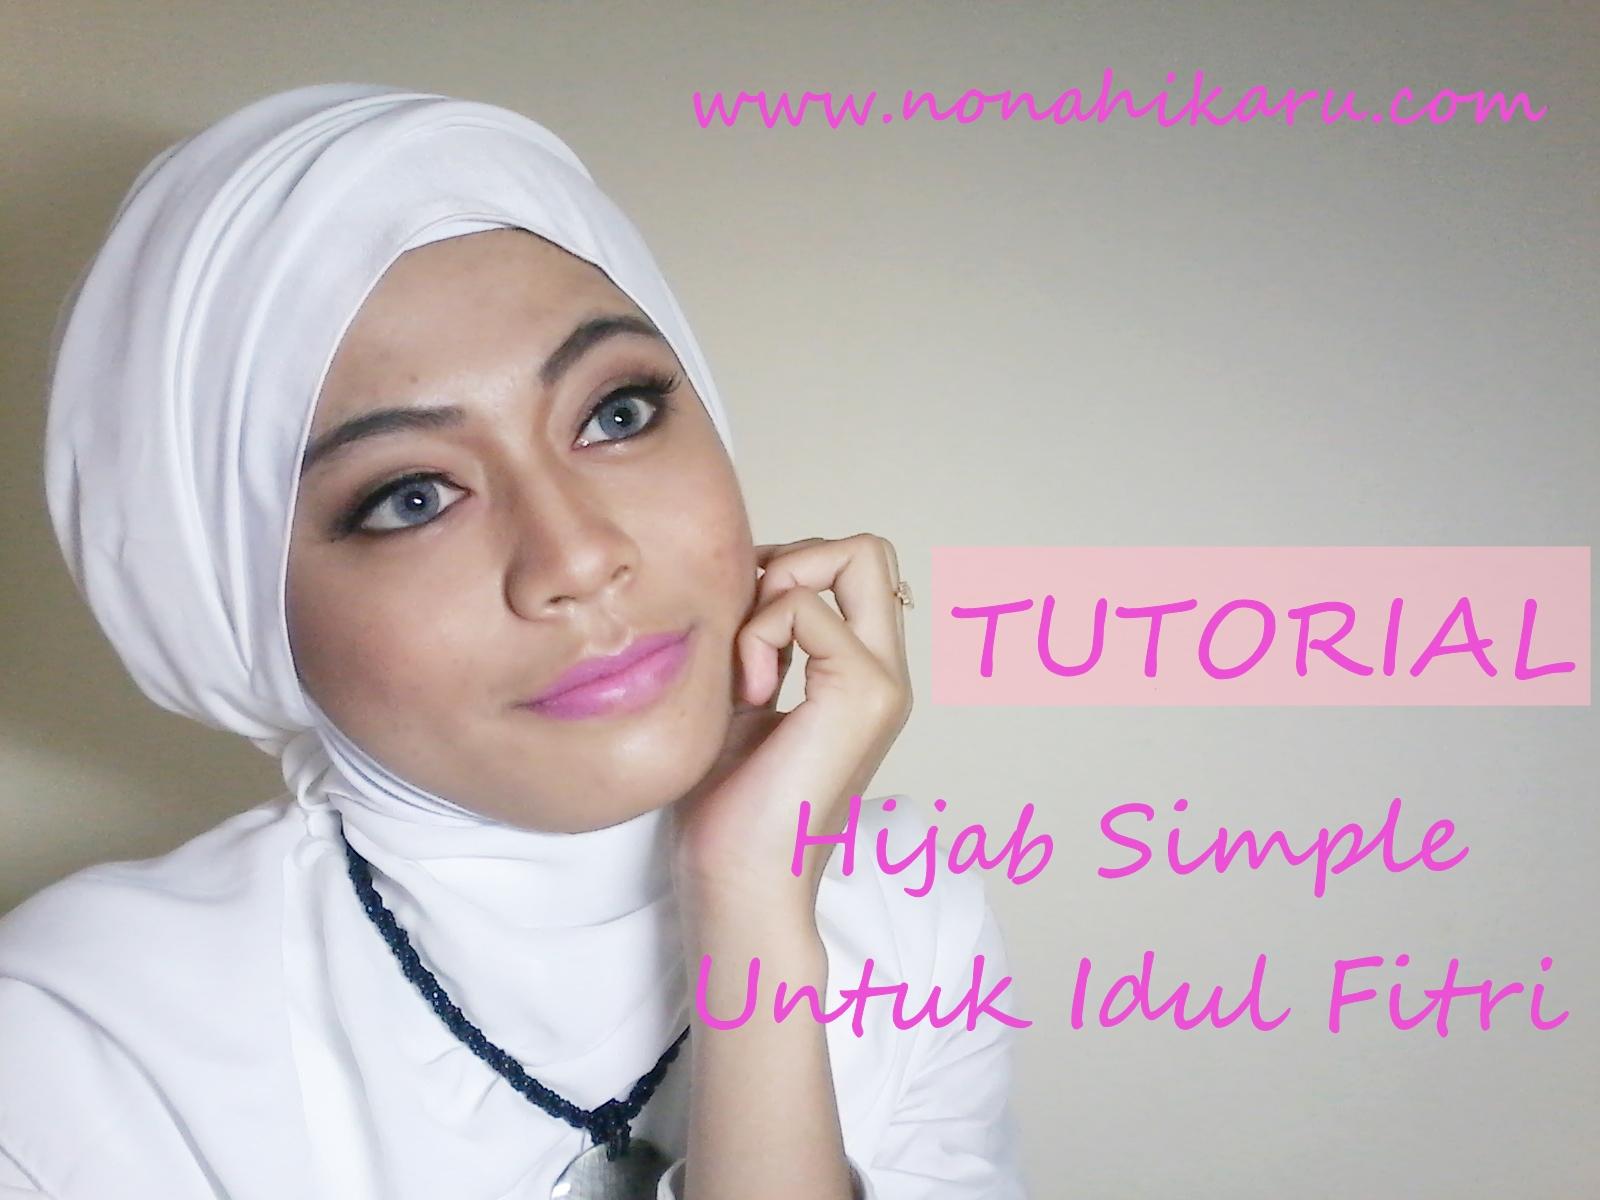 Tutorial Hijab Simple Untuk Idul Fitri Beauty Travelling